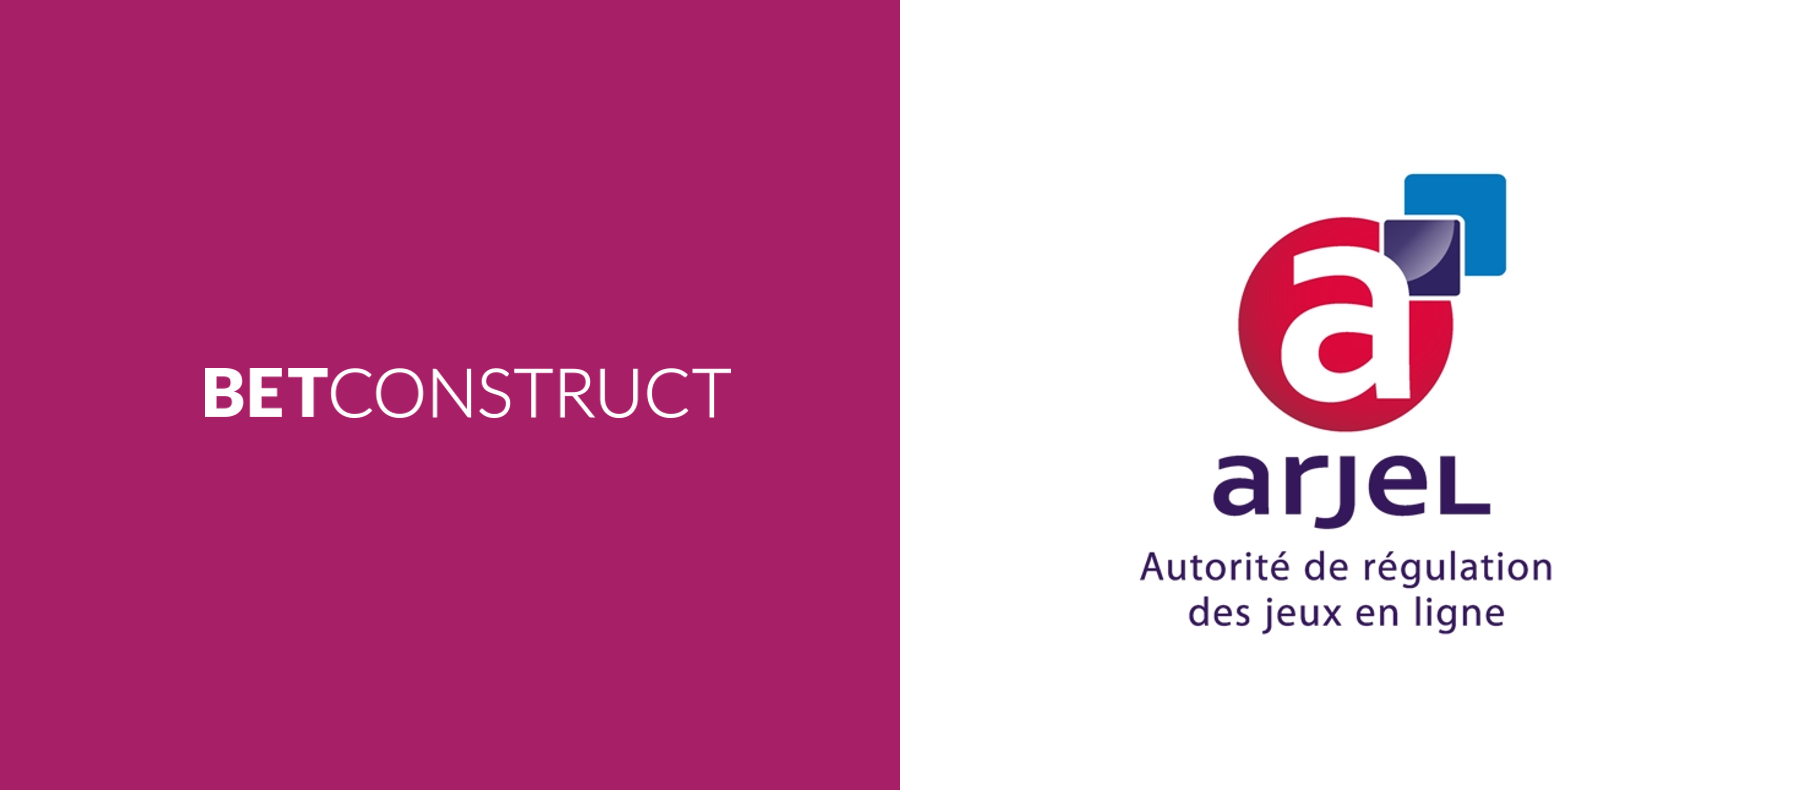 betconstruct arjel